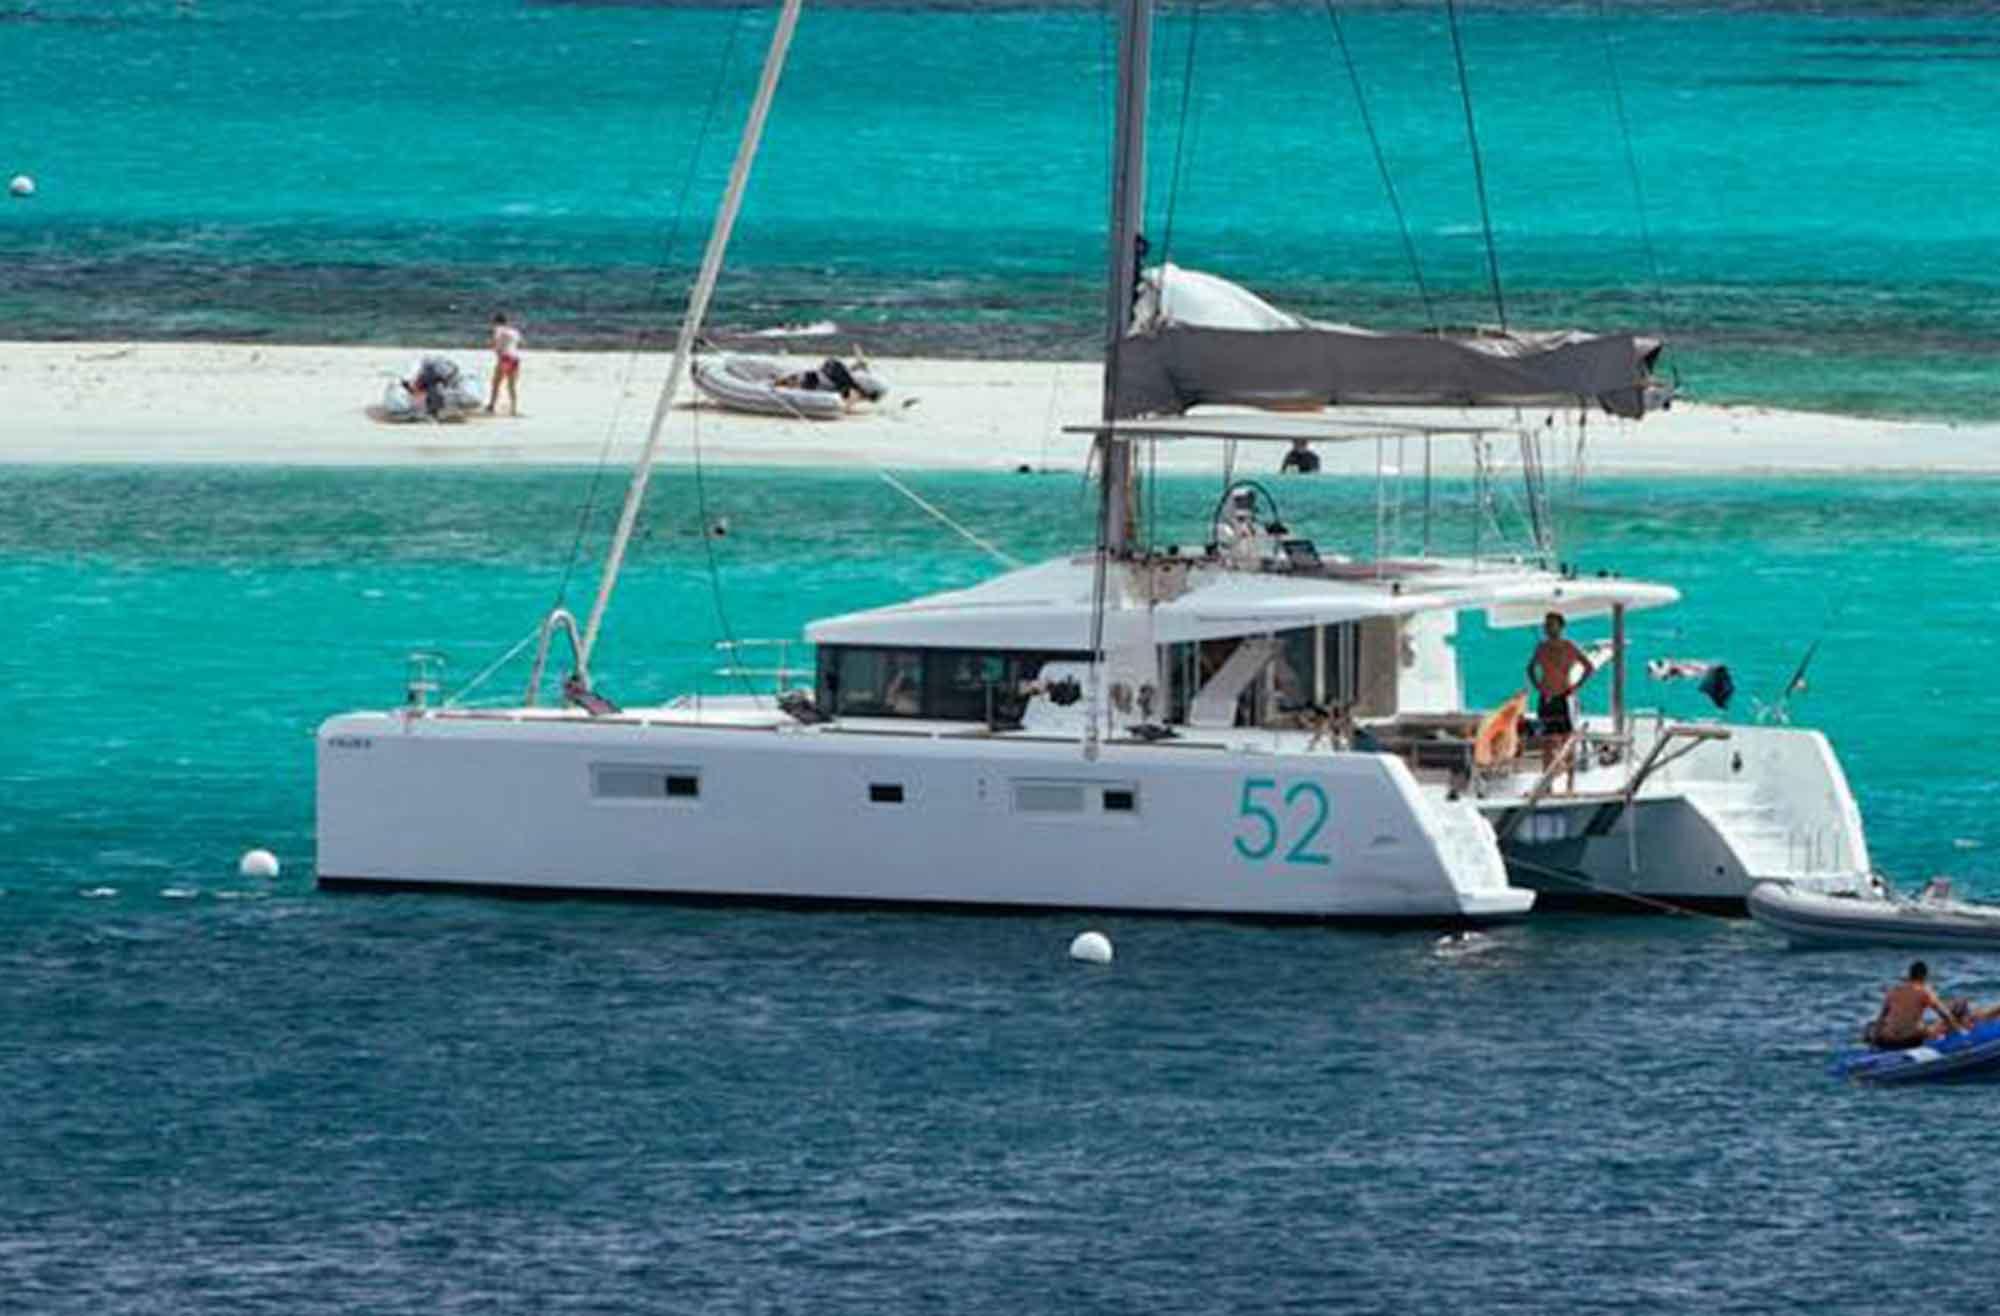 Sail Ionian Yacht Lagoon (52ft)